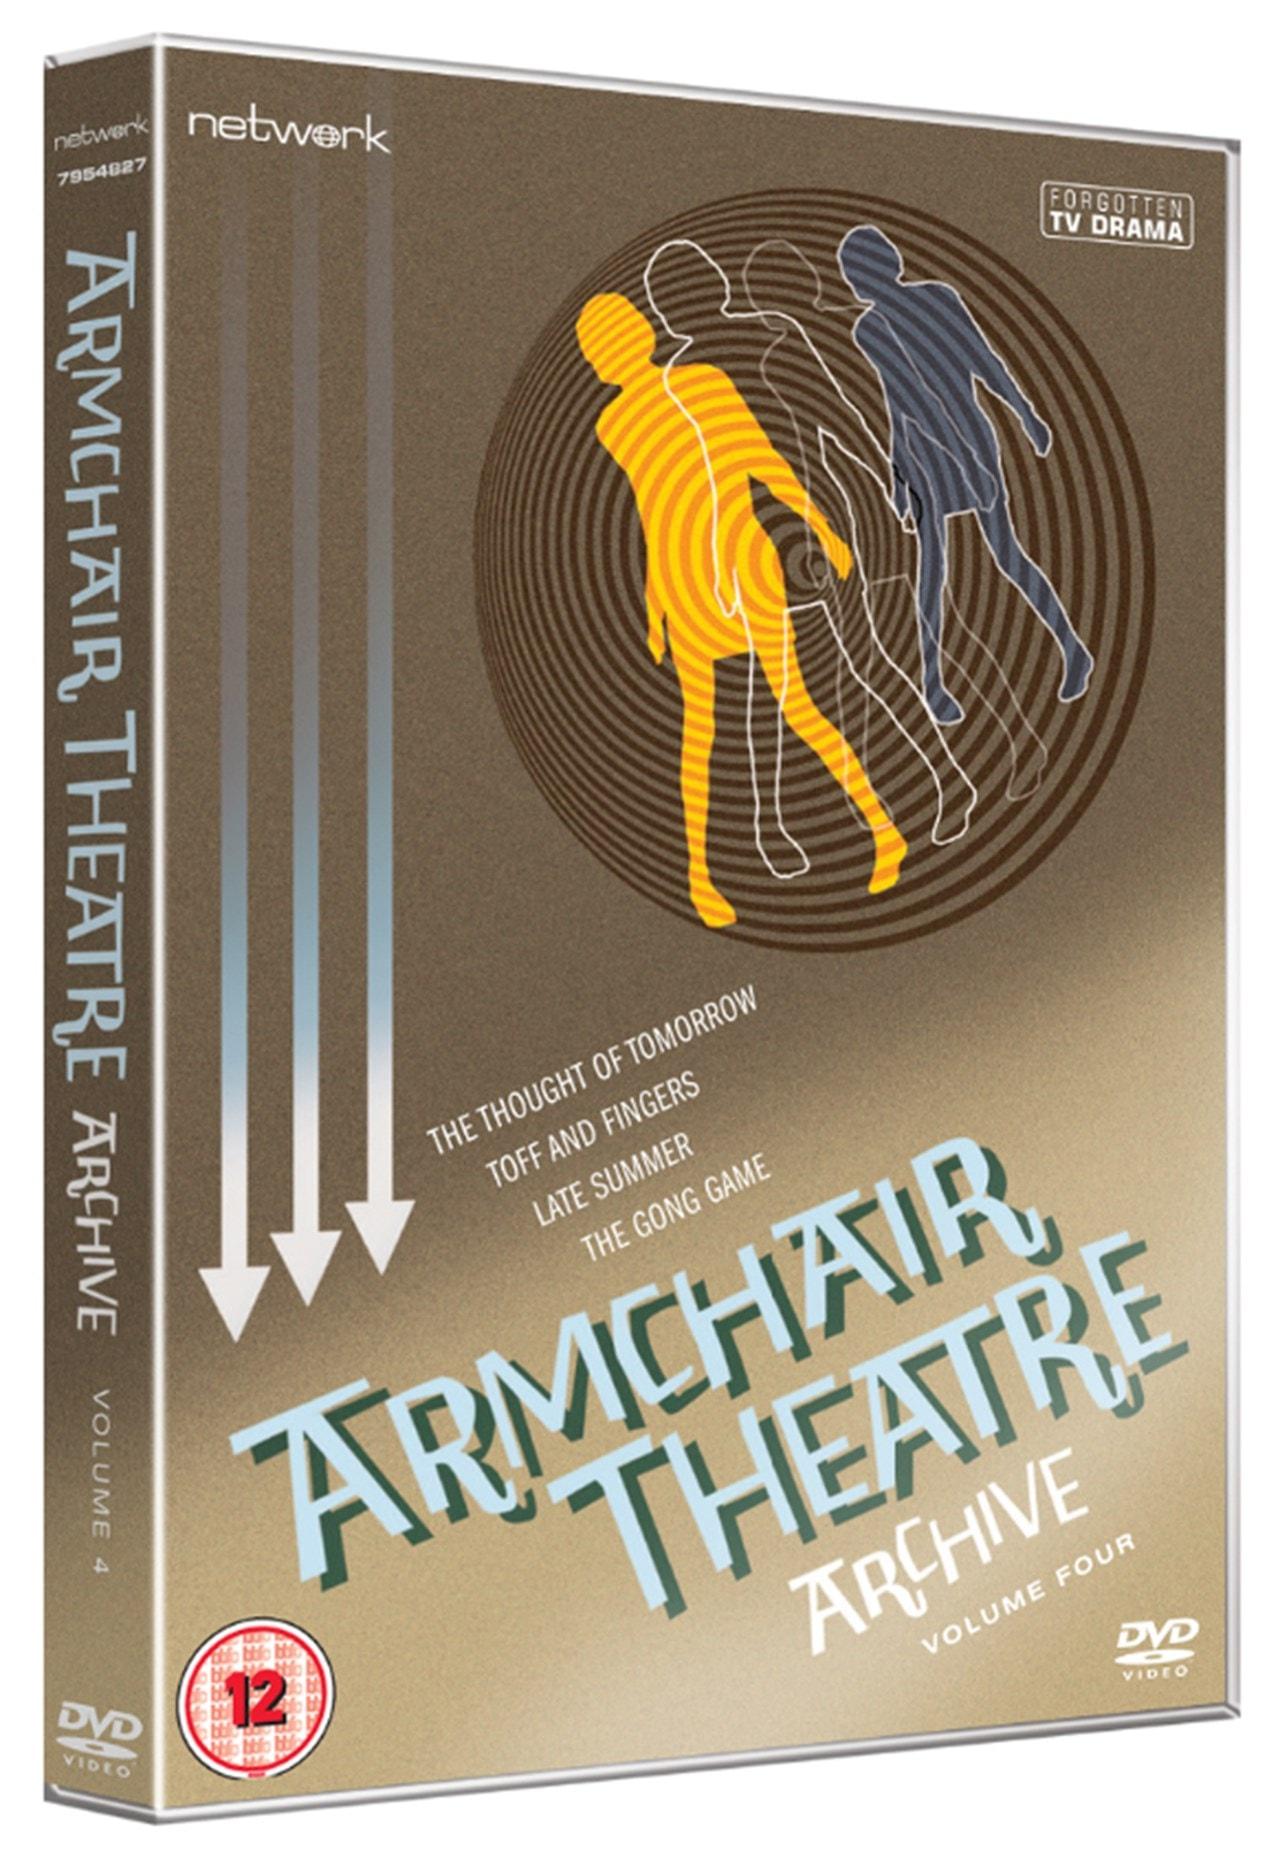 Armchair Theatre Archive: Volume 4 - 2